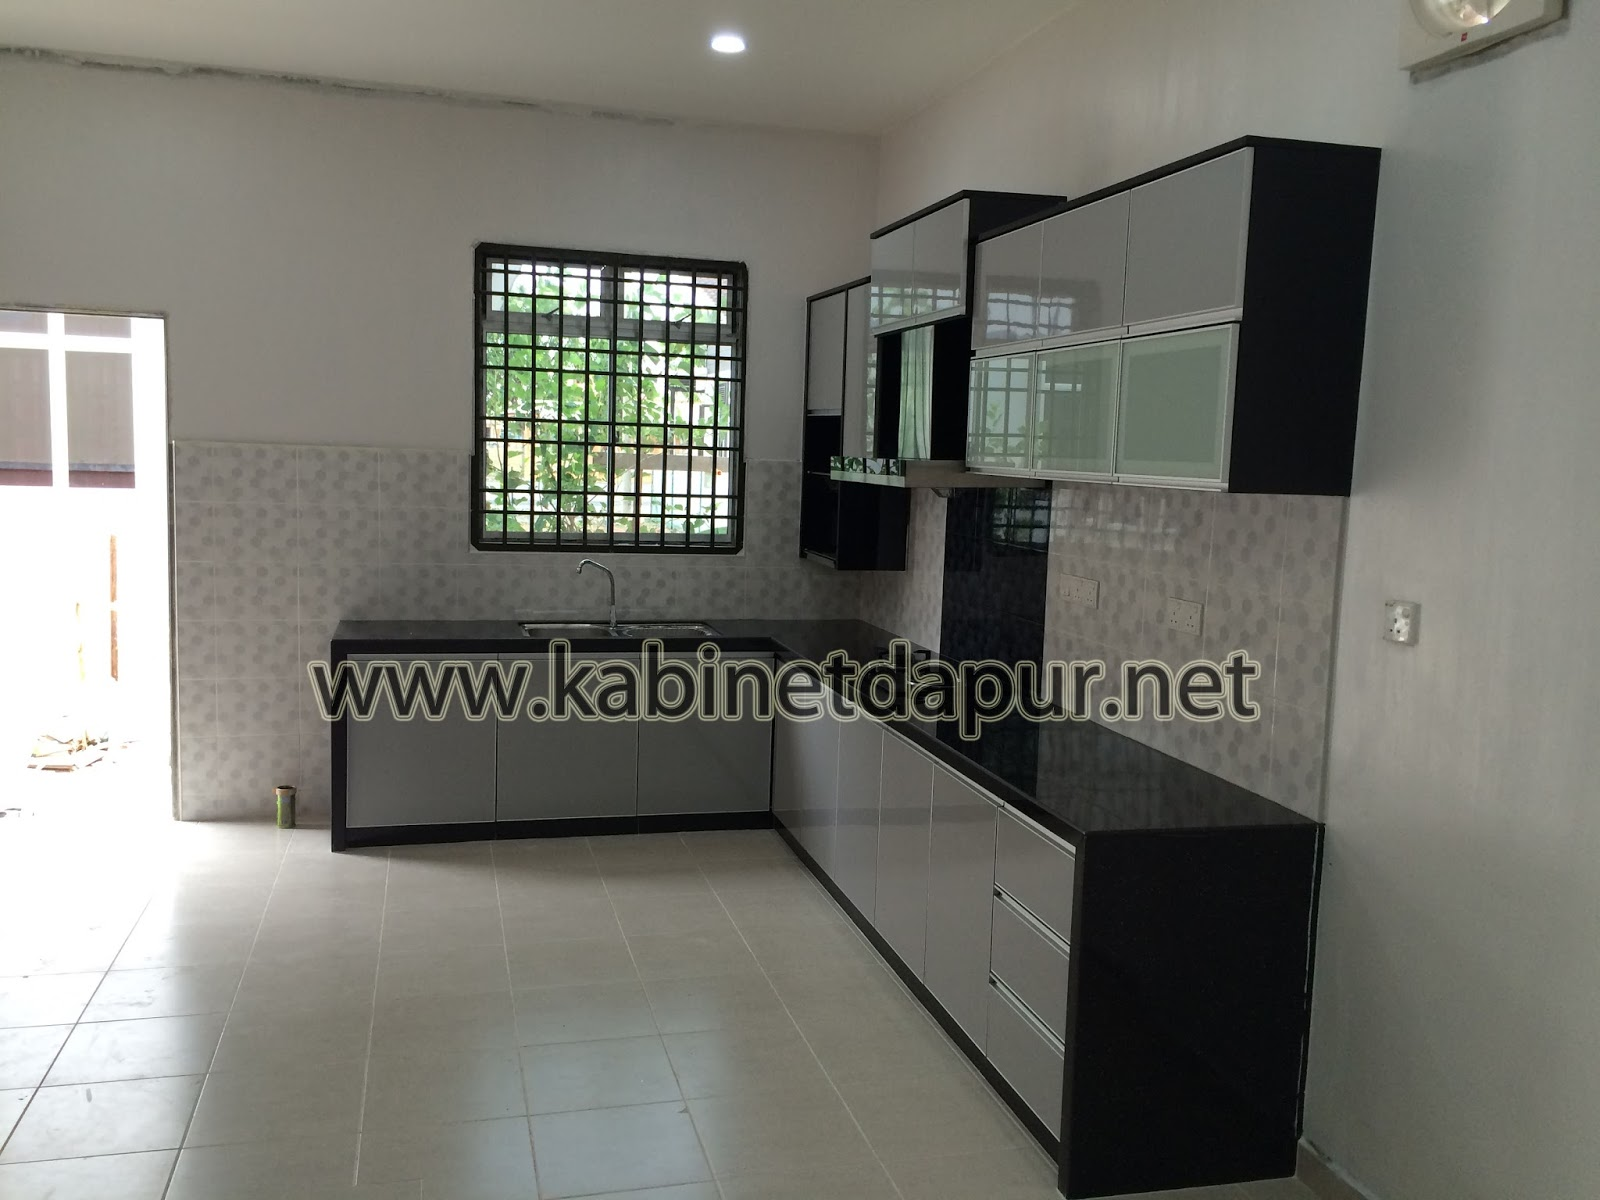 Projek Kabinet Dapur Di Mentaloon Alor Setar Tel 0124934710 En Amir